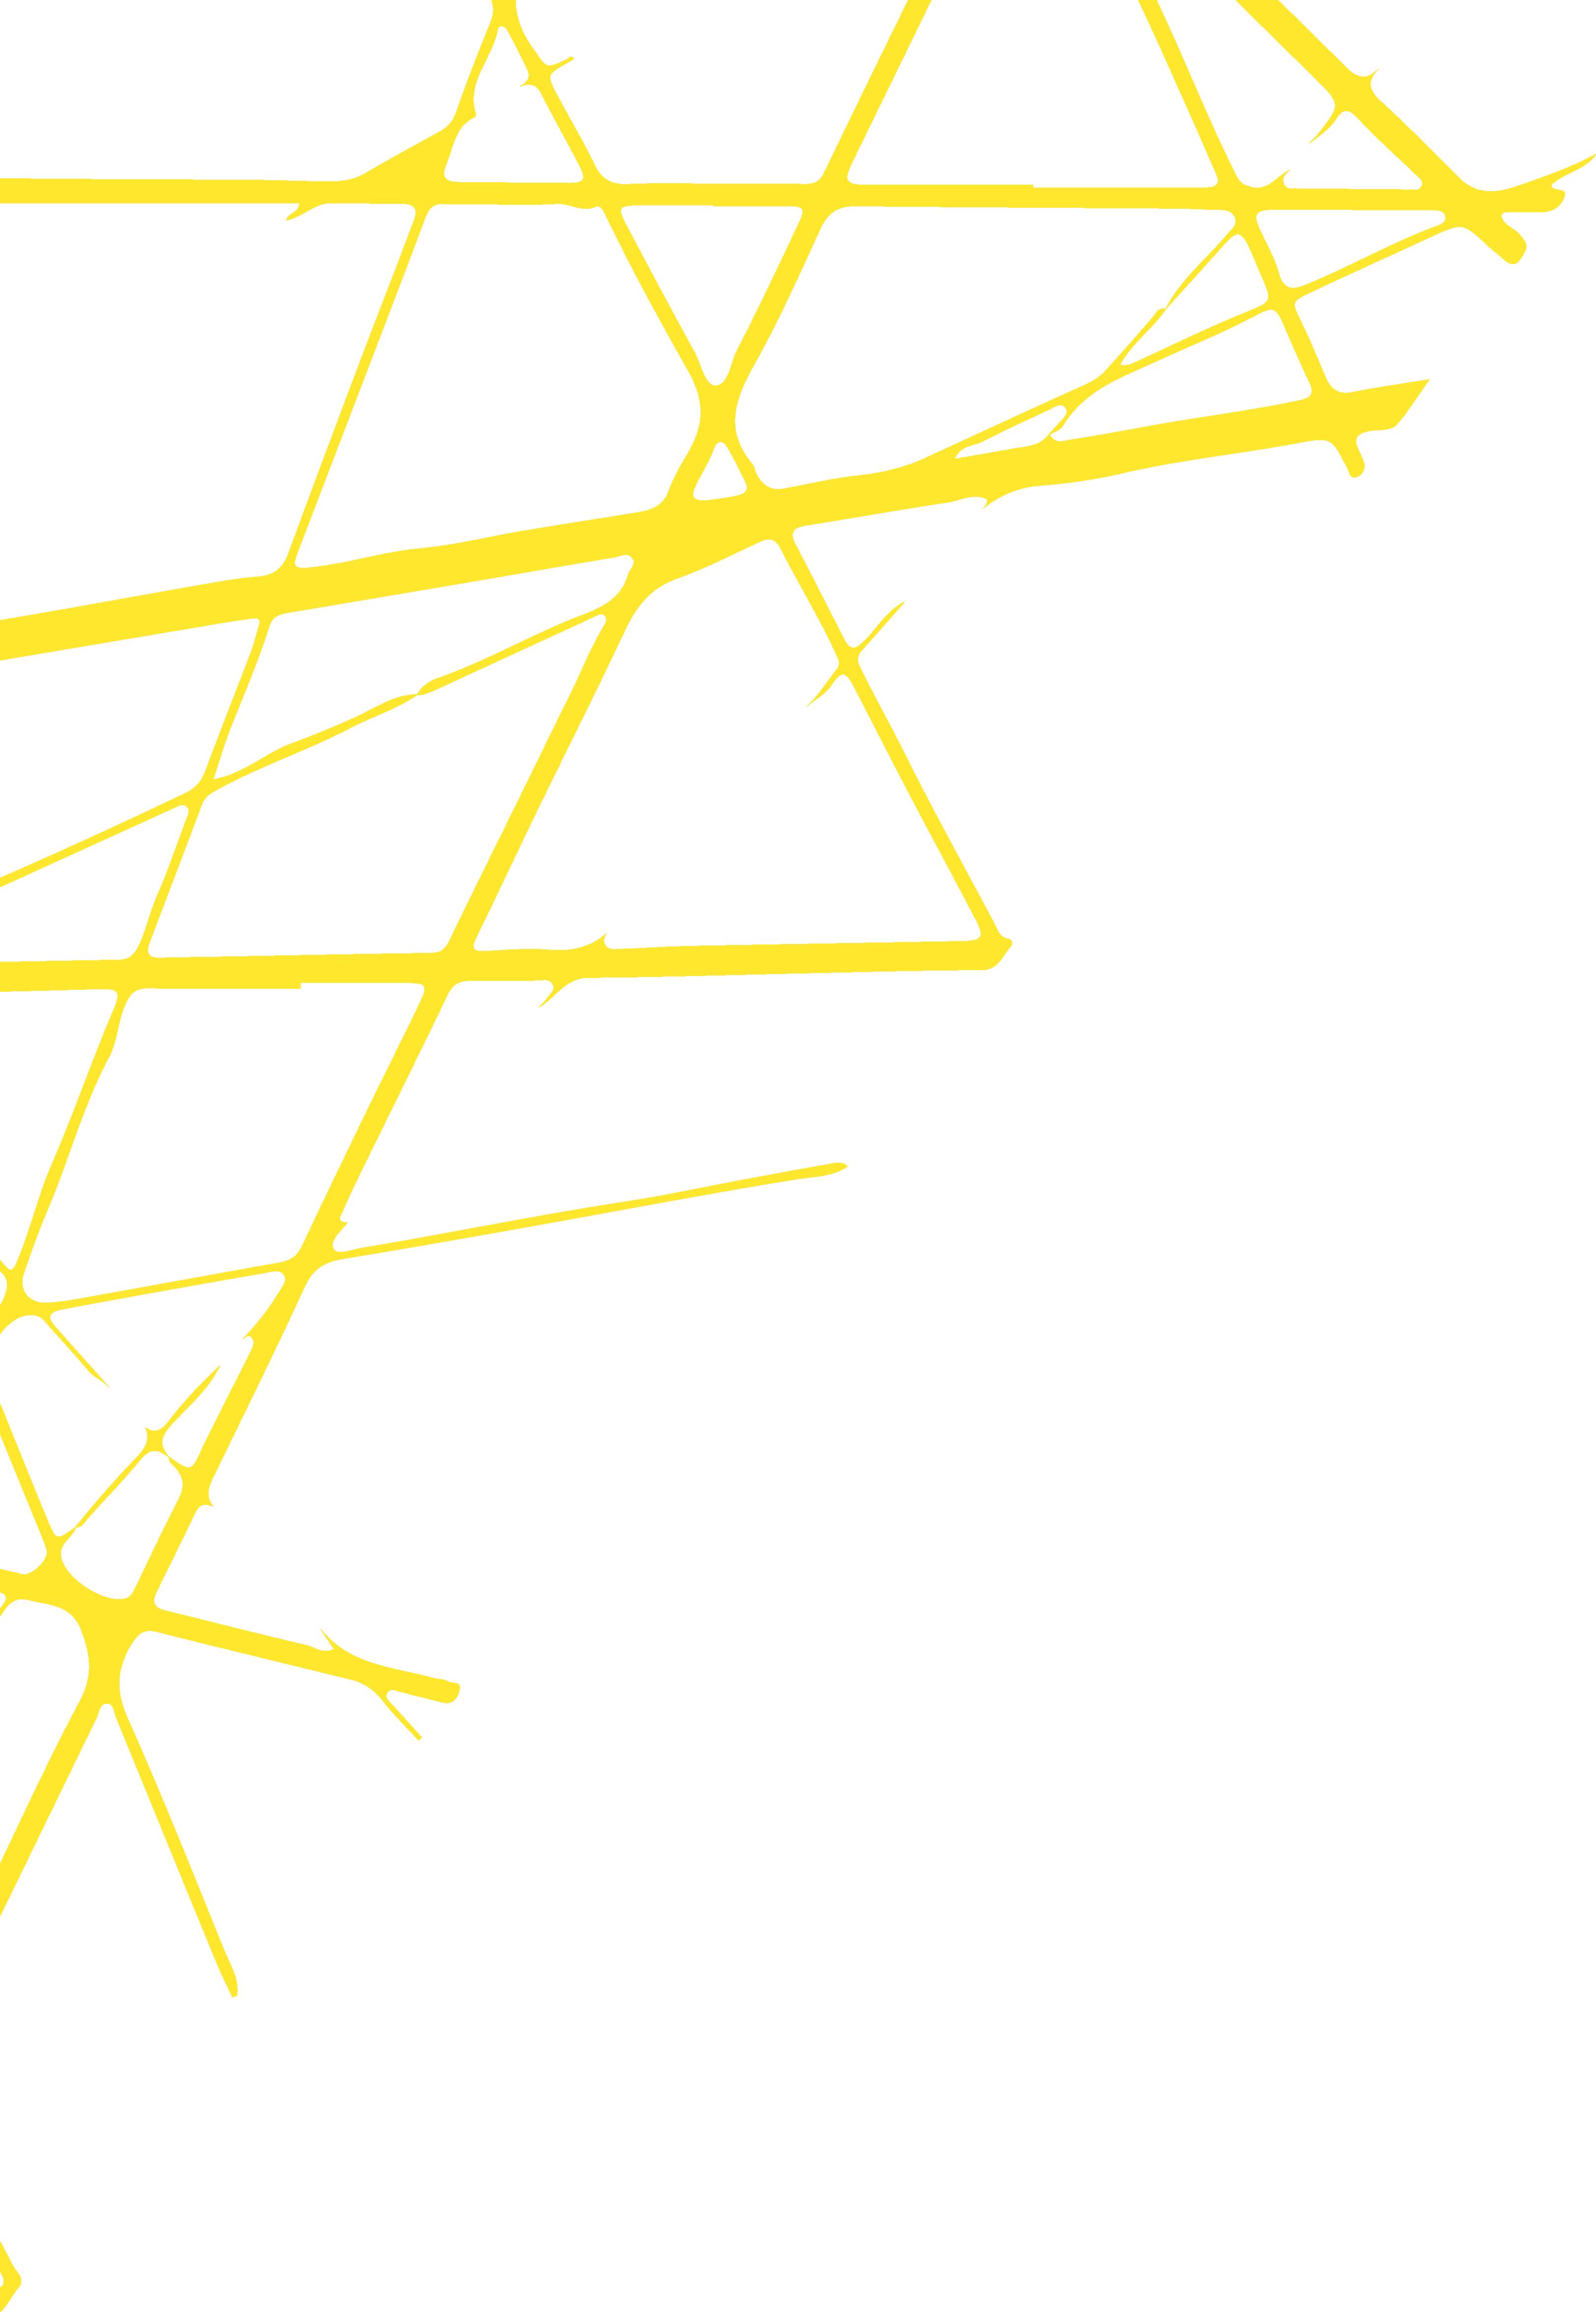 Clarendon Centre Branded graphic 1